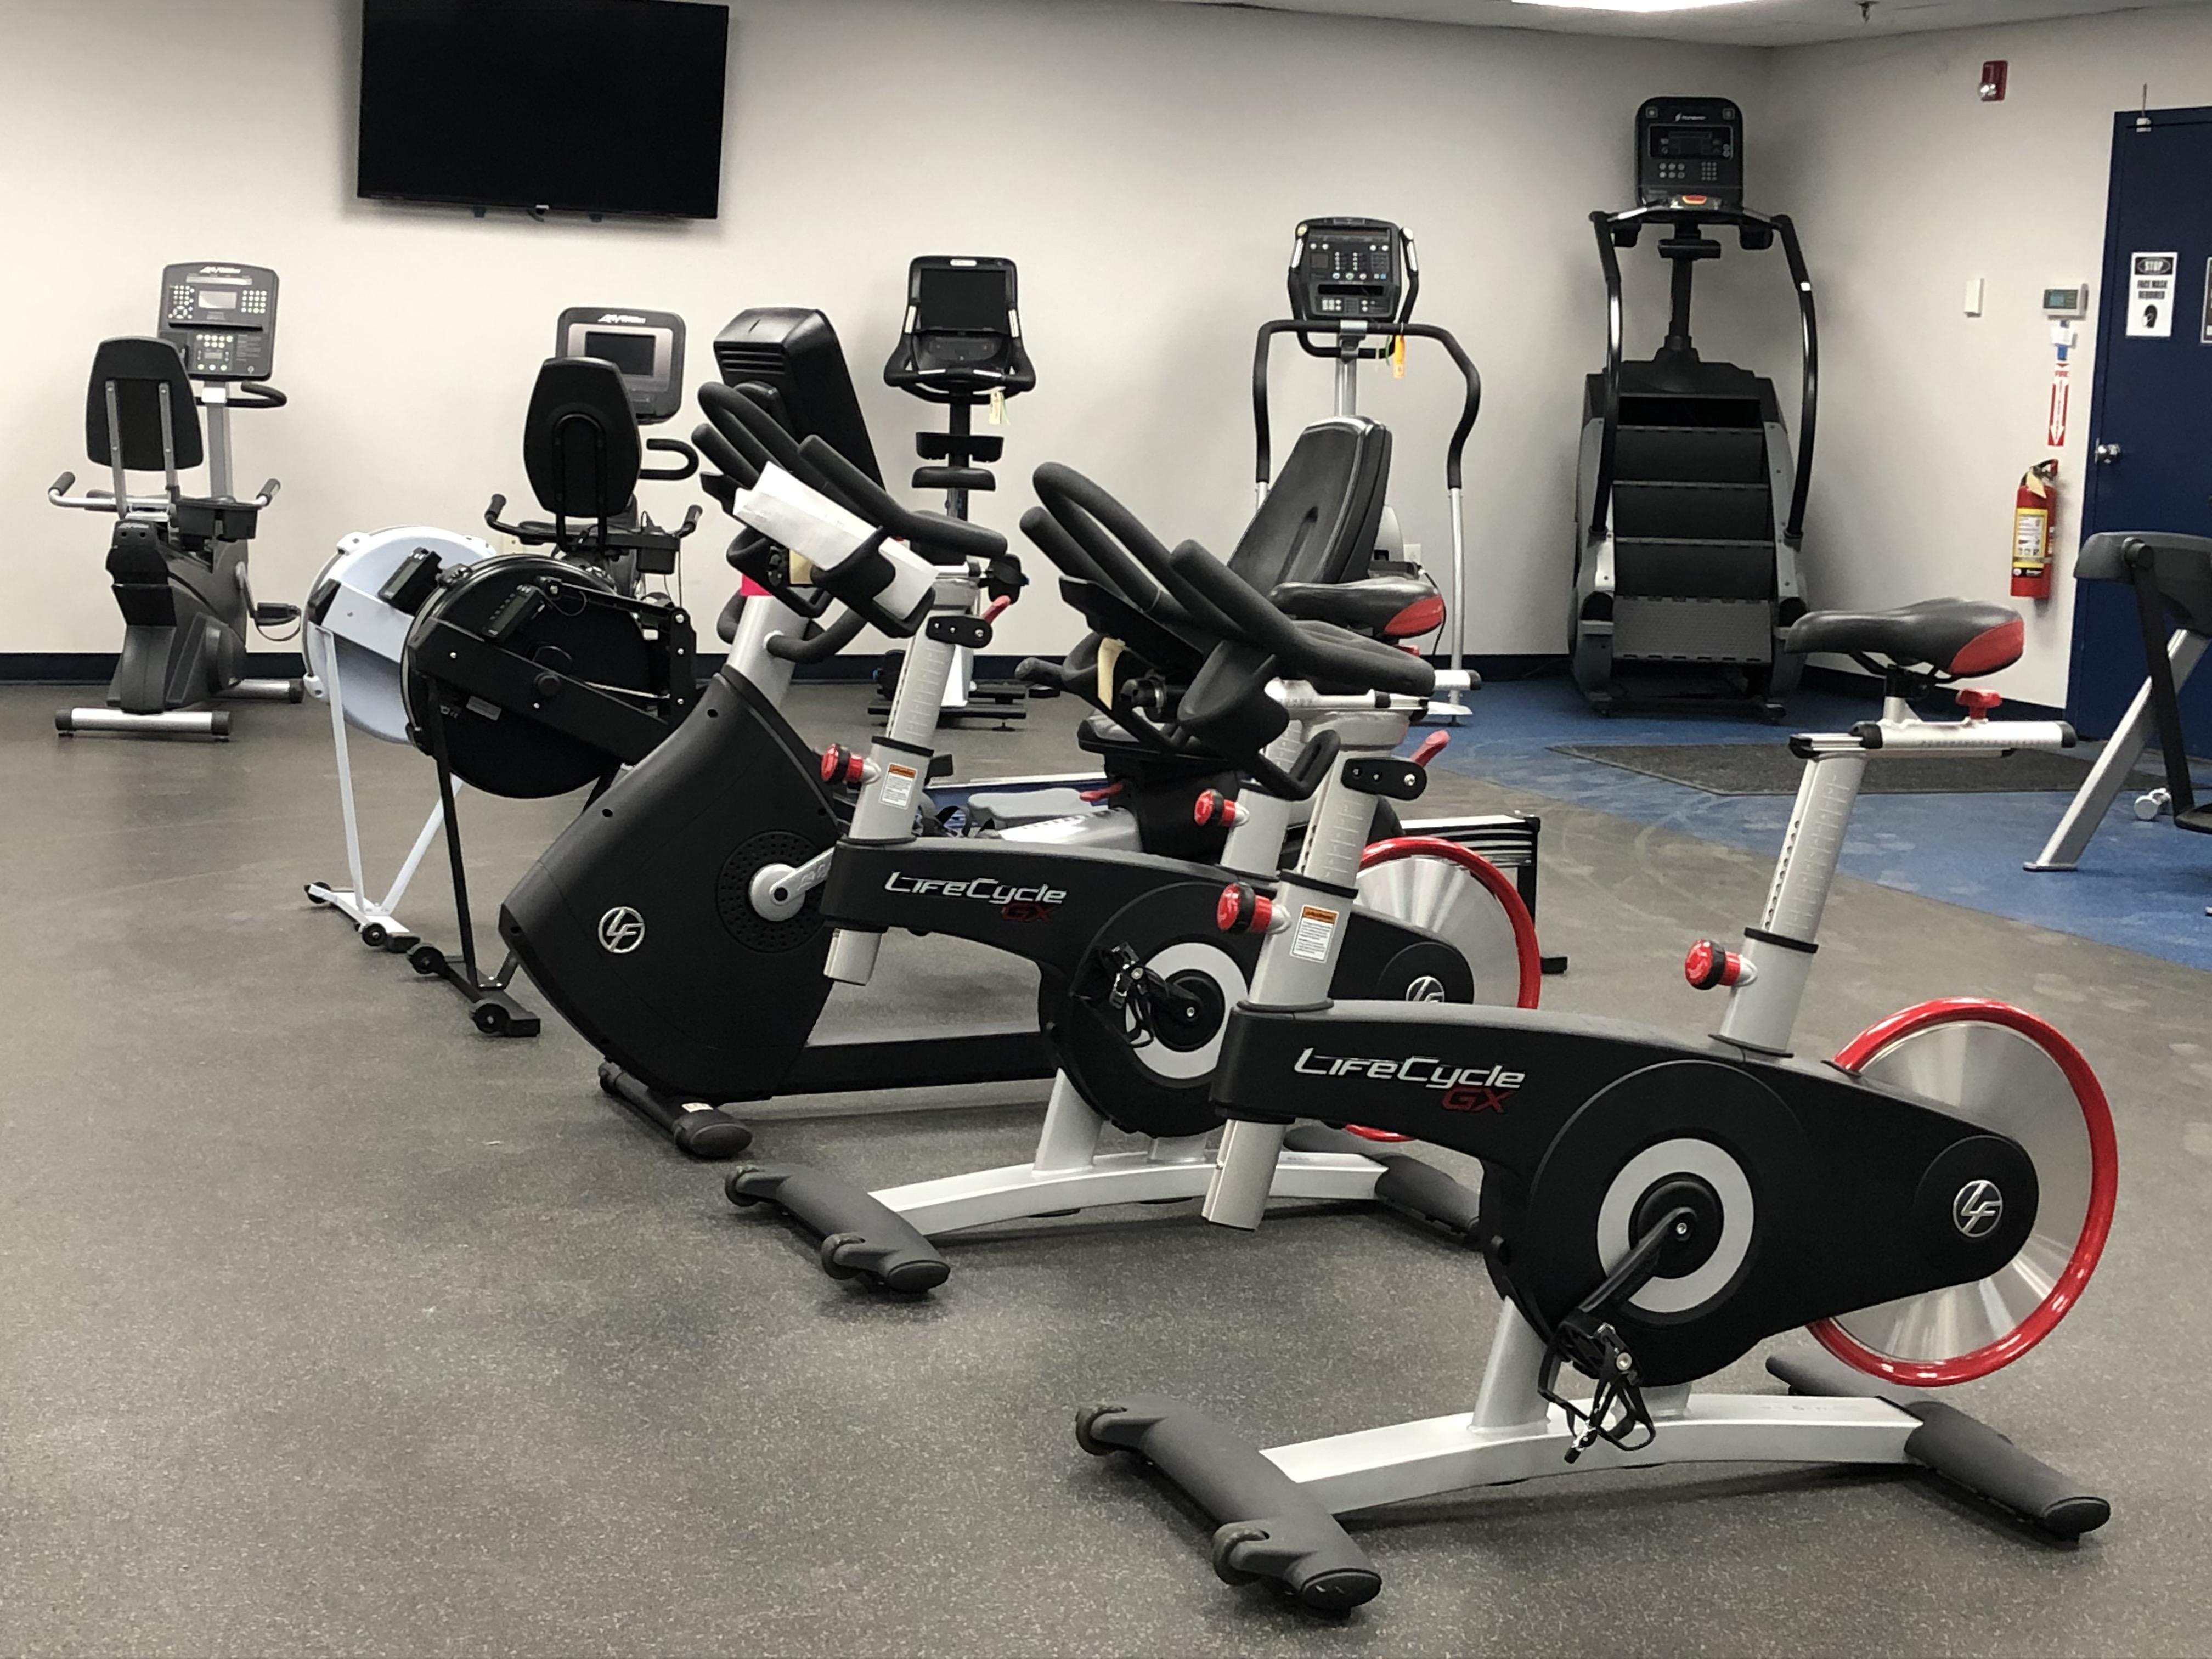 Fitness Brokers Showroom, Foxoboro, MA